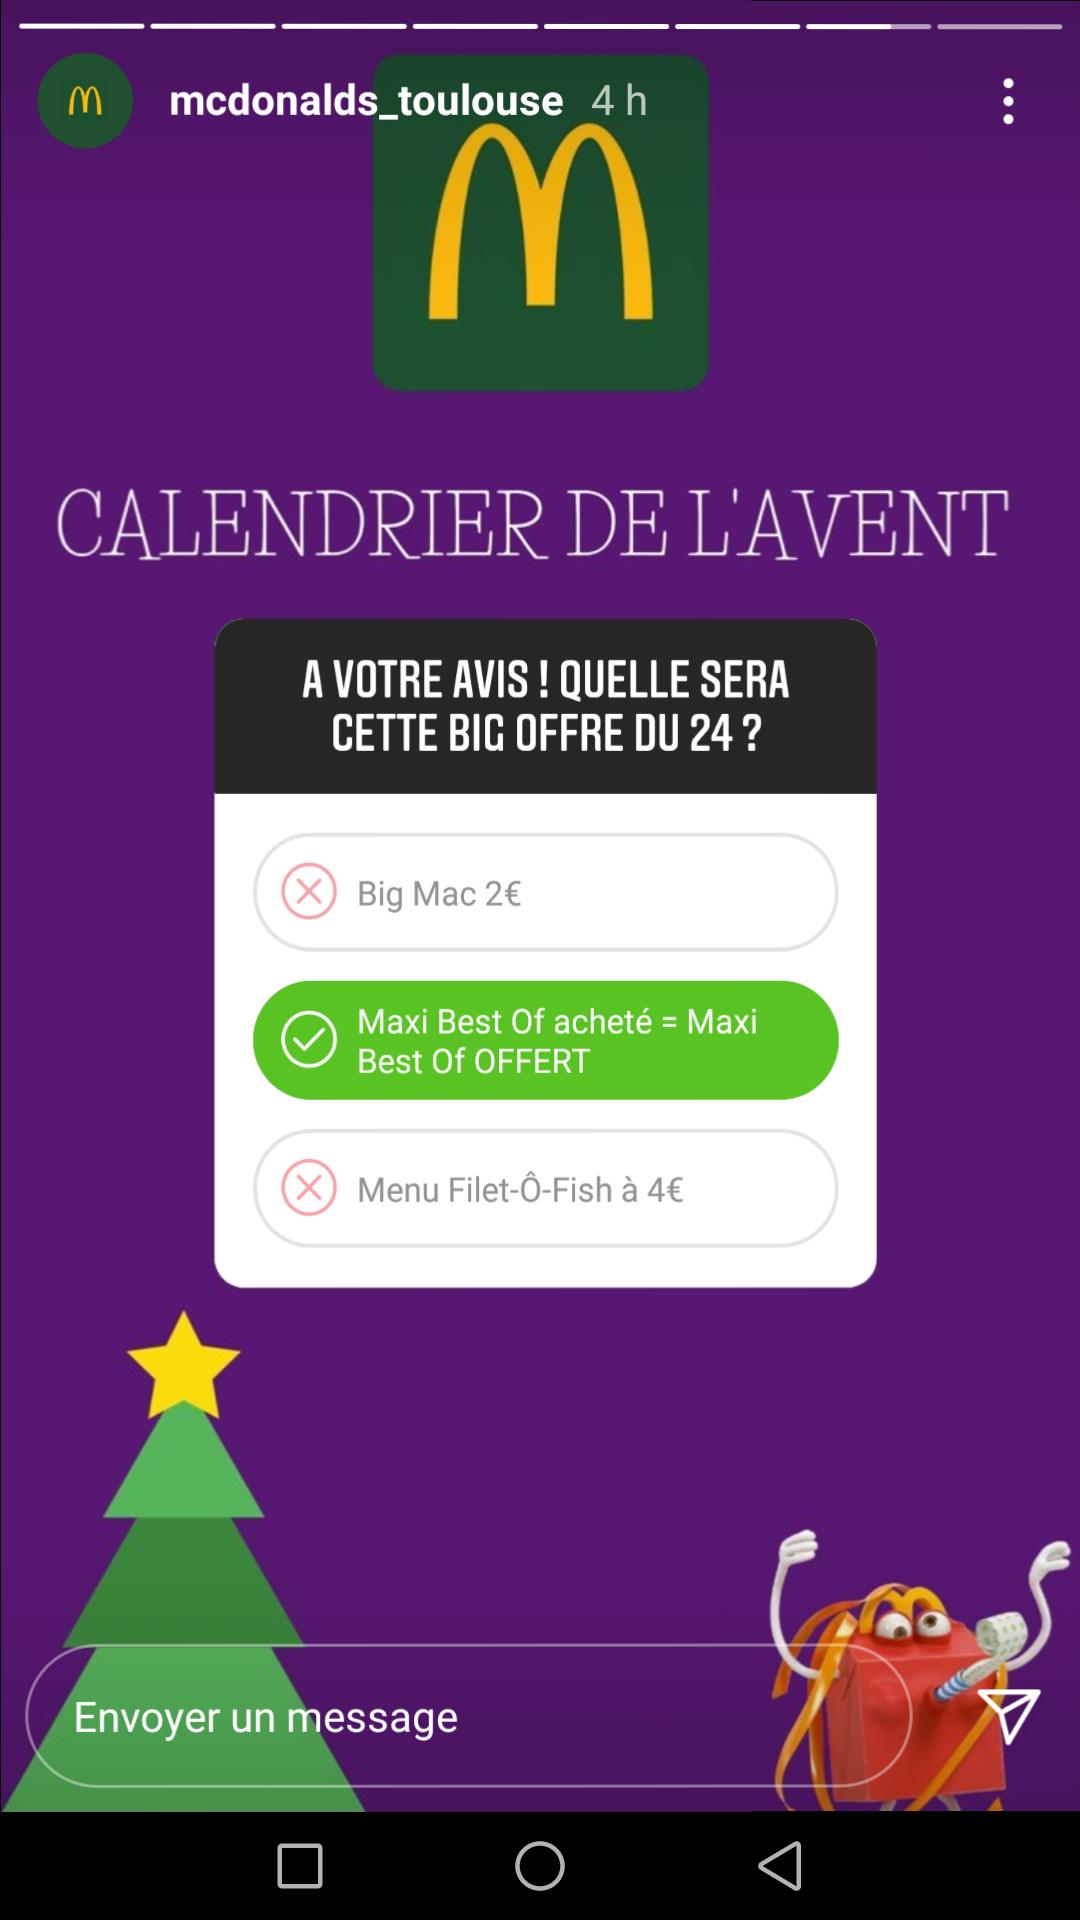 1 menu Maxi Best Of acheté = 1 menu Maxi Best Of offert - Toulouse (31)